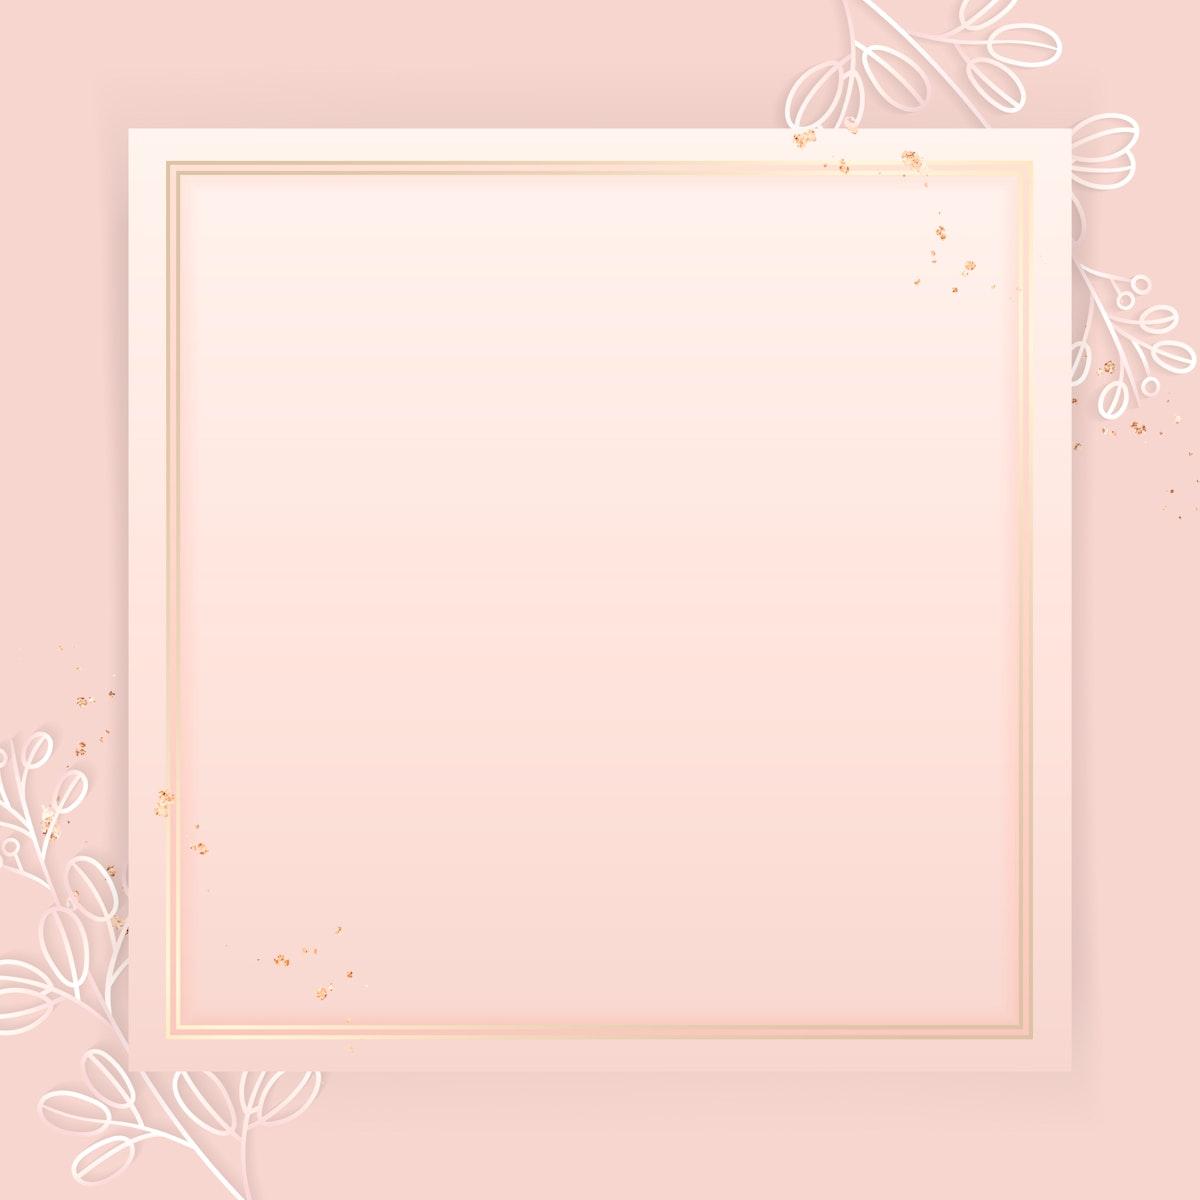 Square gold frame on floral pattern pink background vector